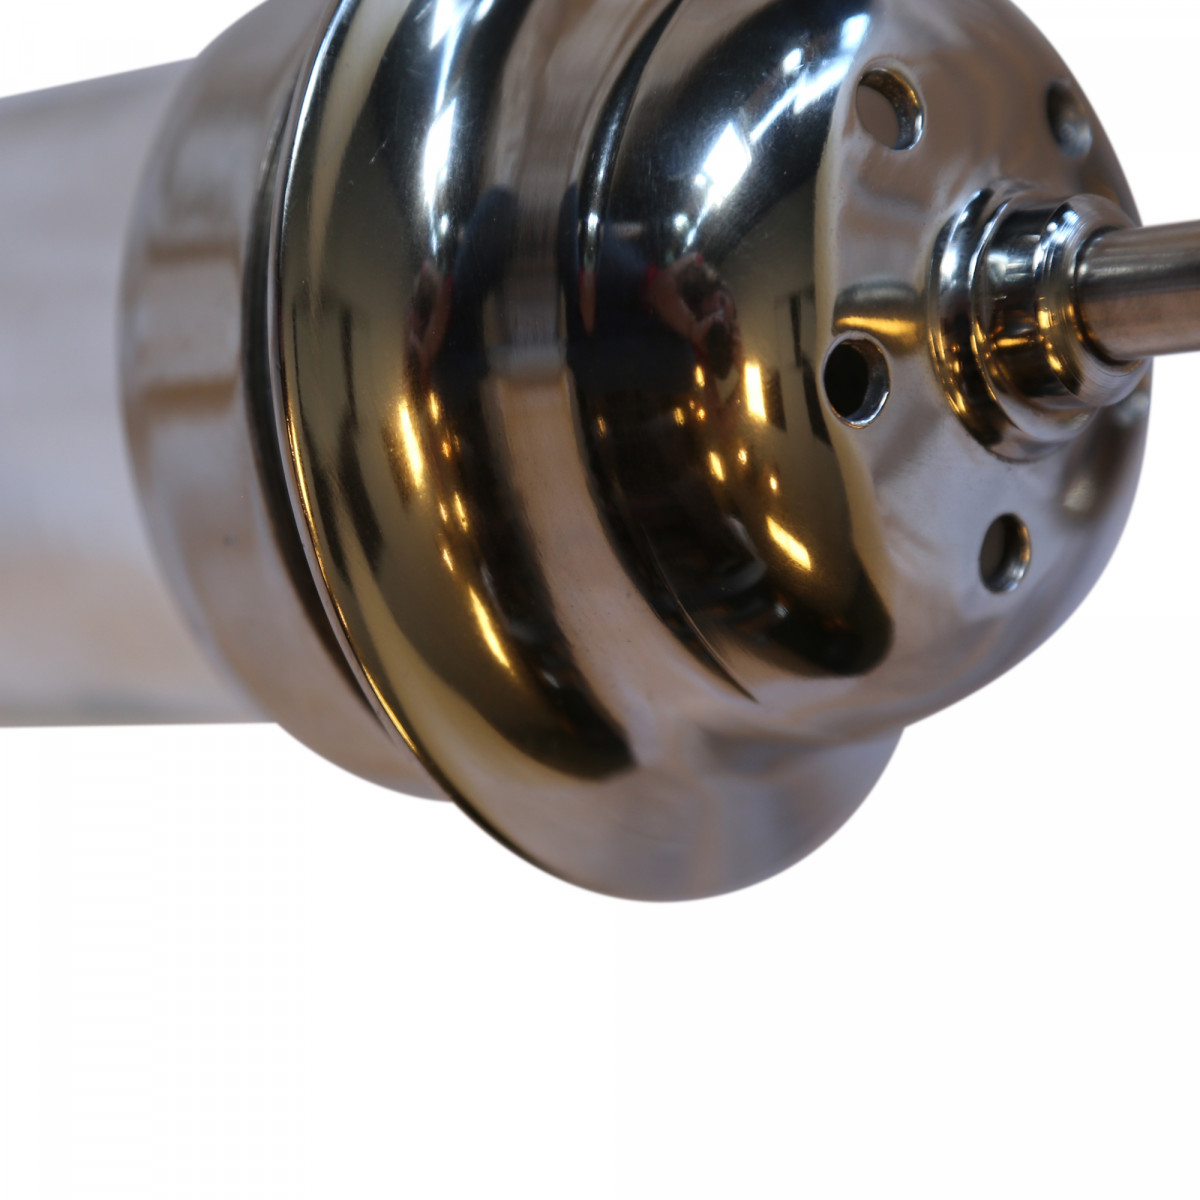 Industrielle Vintage Corby Wandlampe - Wandlampe - Lampen